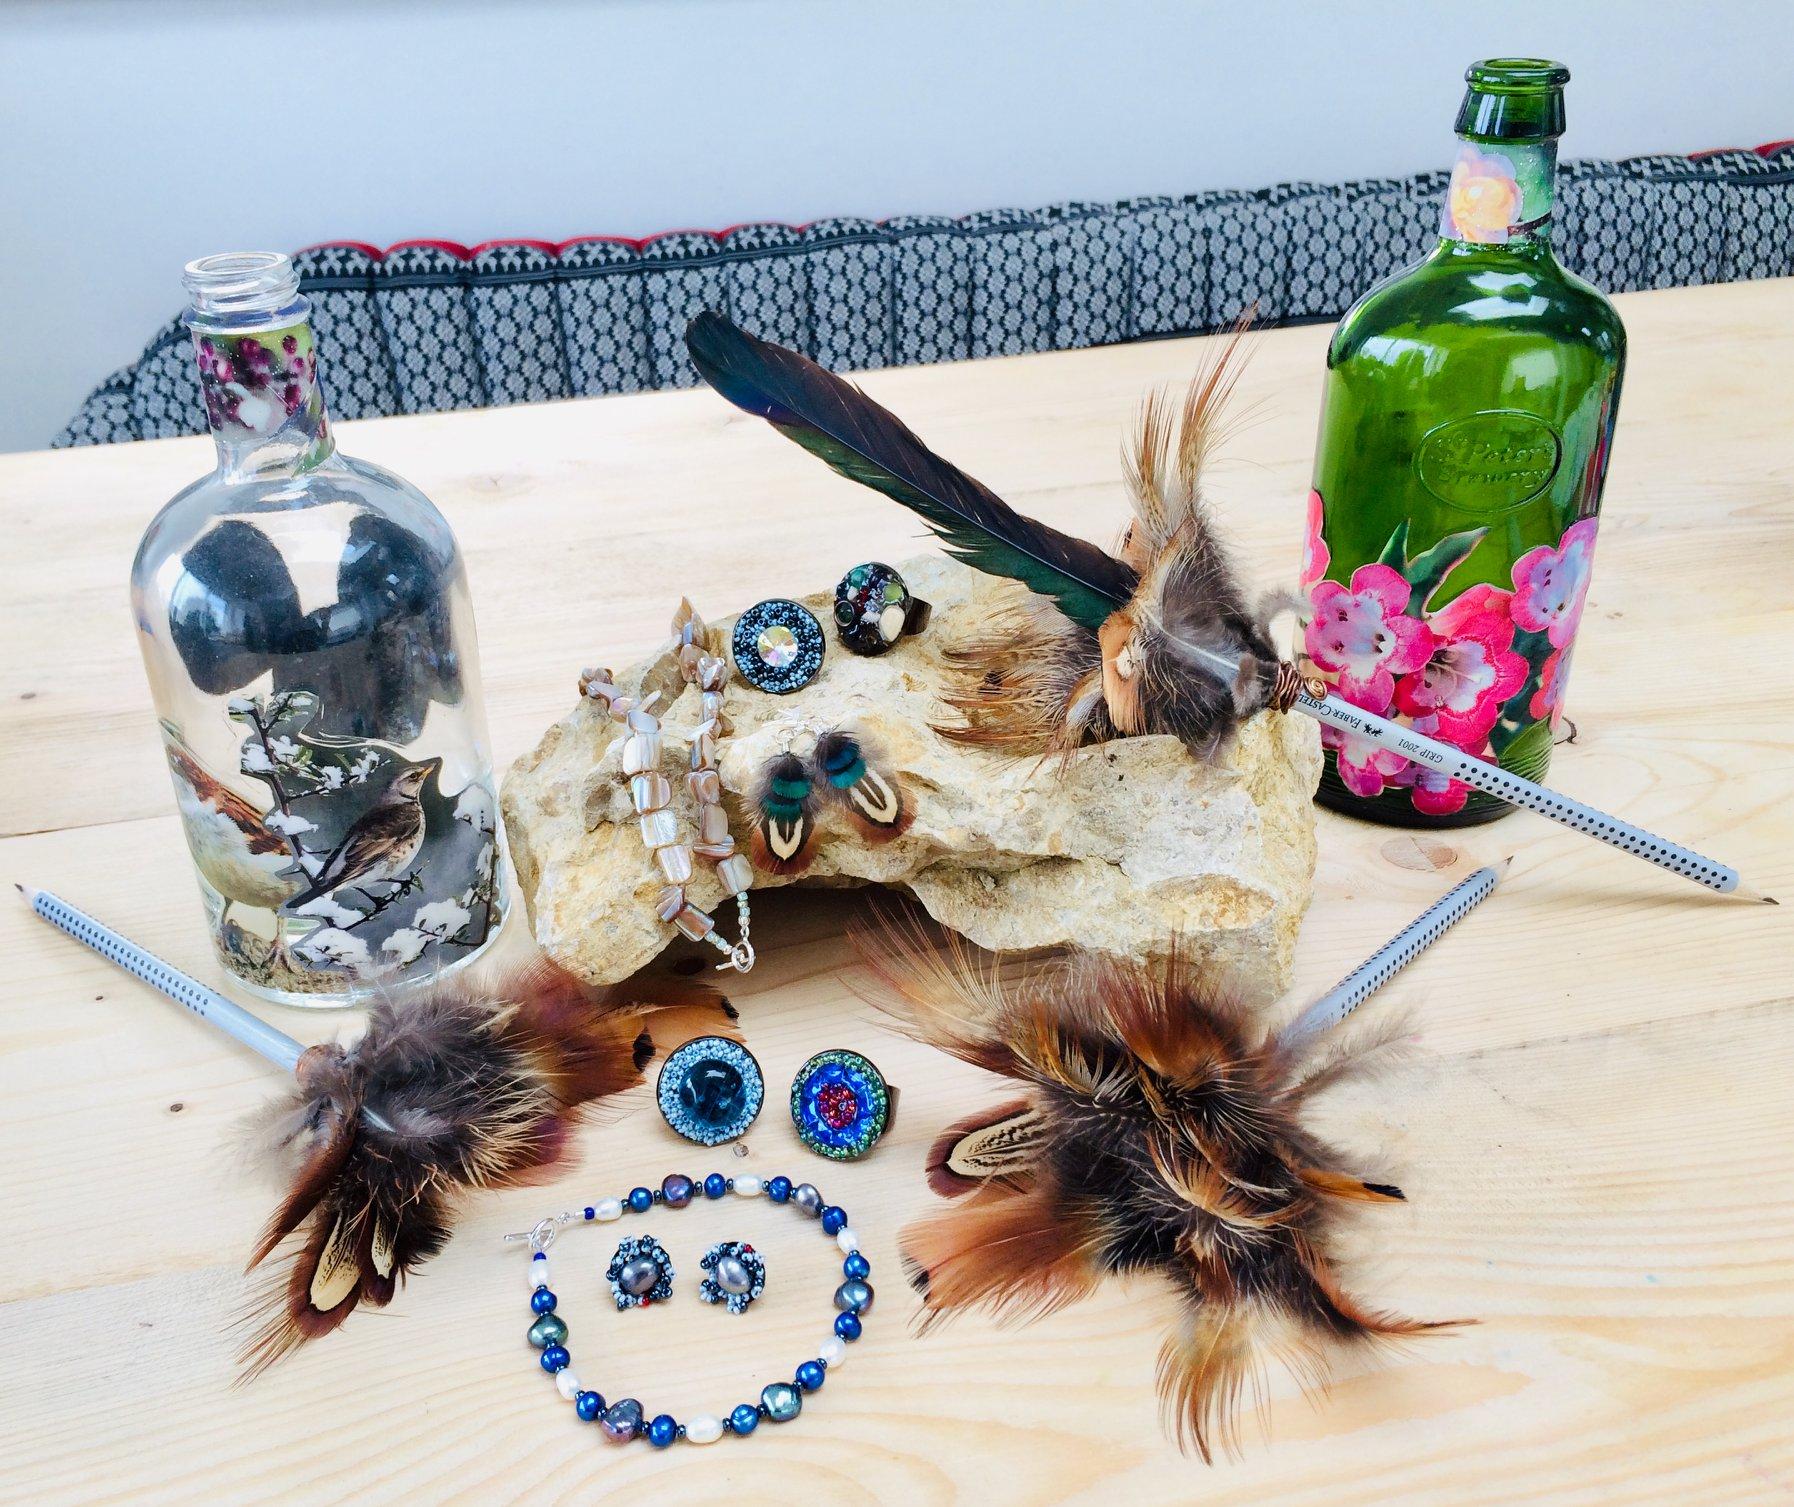 starling handmade treasures.jpg